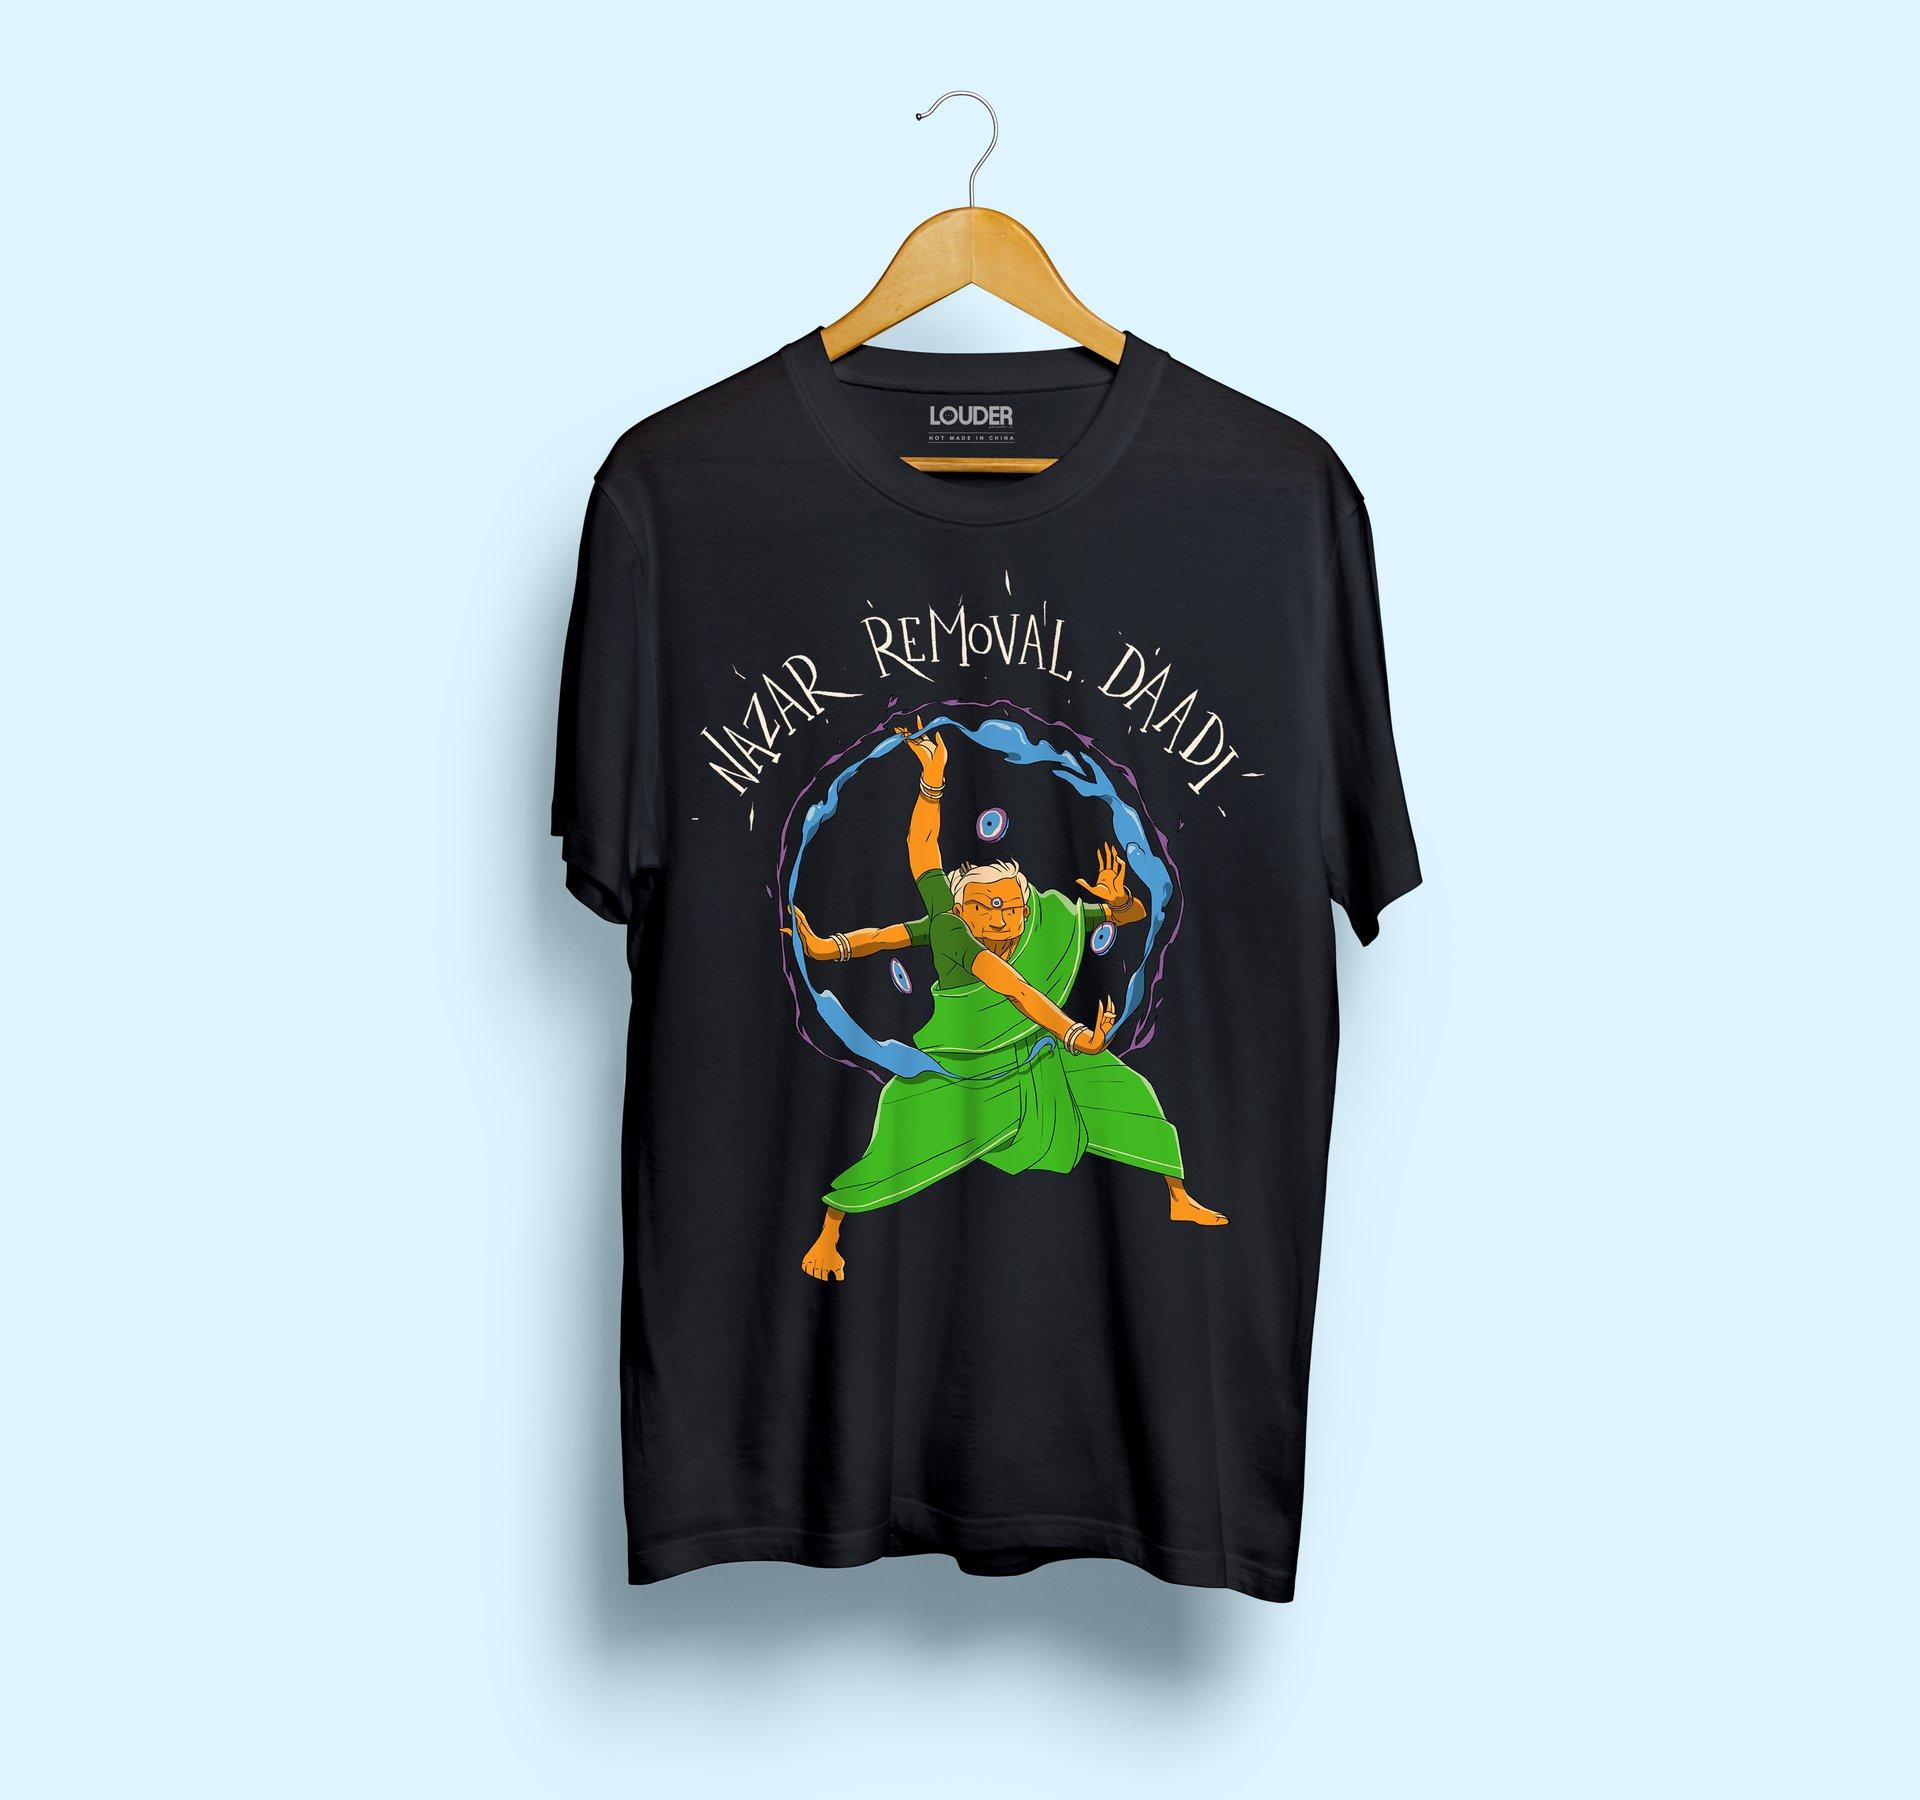 Nazar Removal T-shirt - ₹499